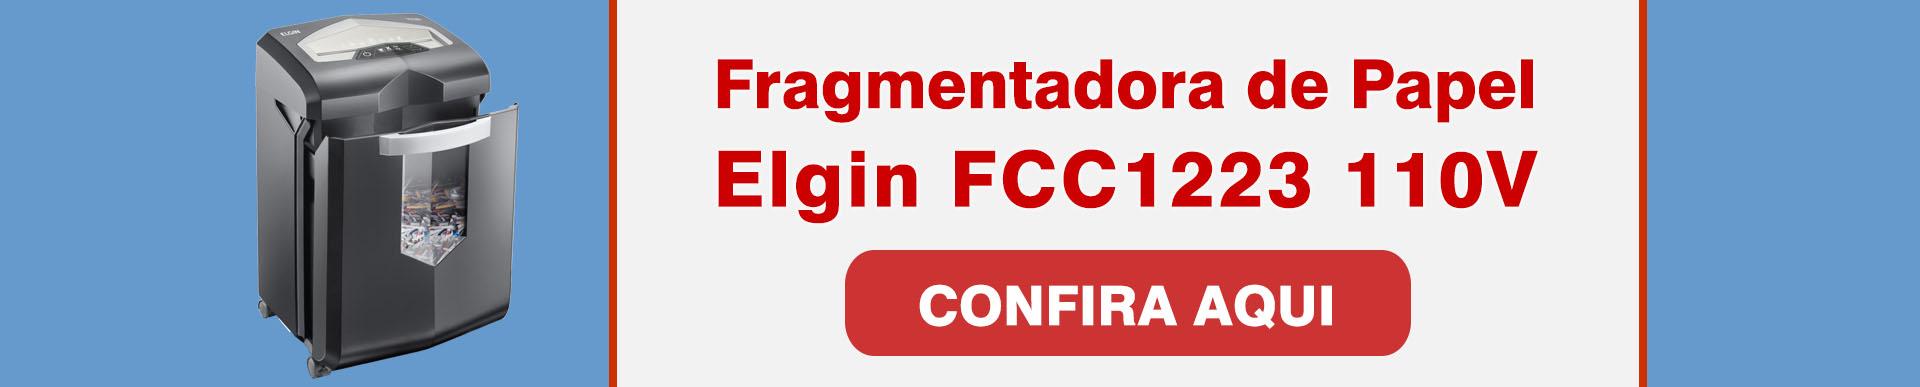 Fragmentadora de Papel Elgin FCC1223